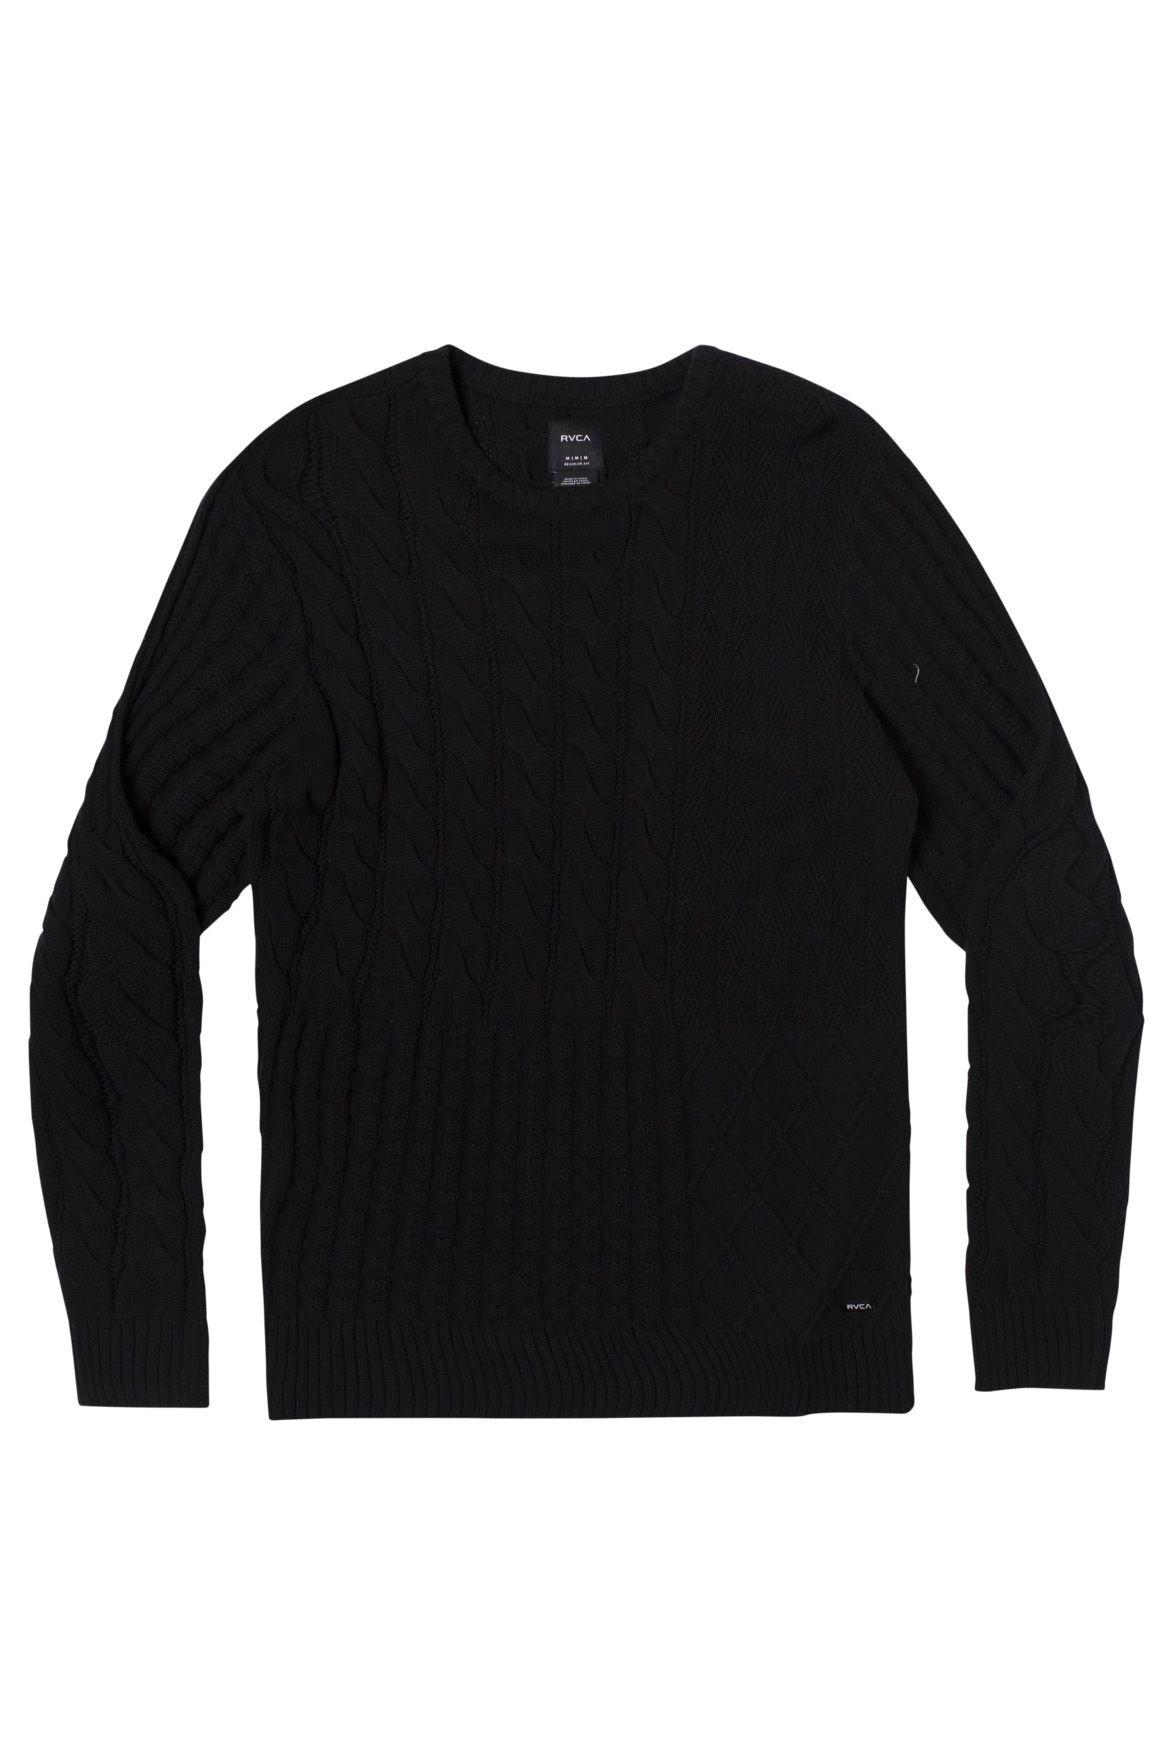 Camisola RVCA DESMOND SWEATER Black